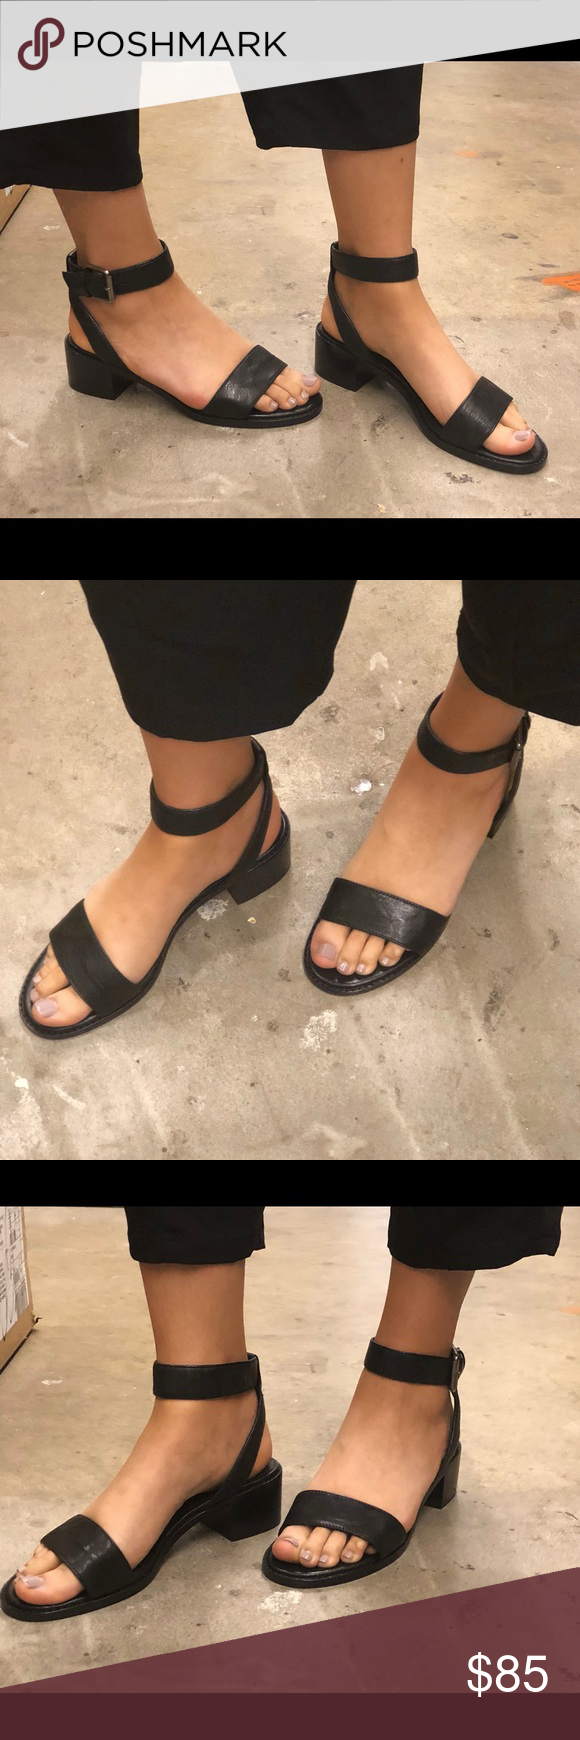 Frye Cindy 2 Piece Sandals size 8.5